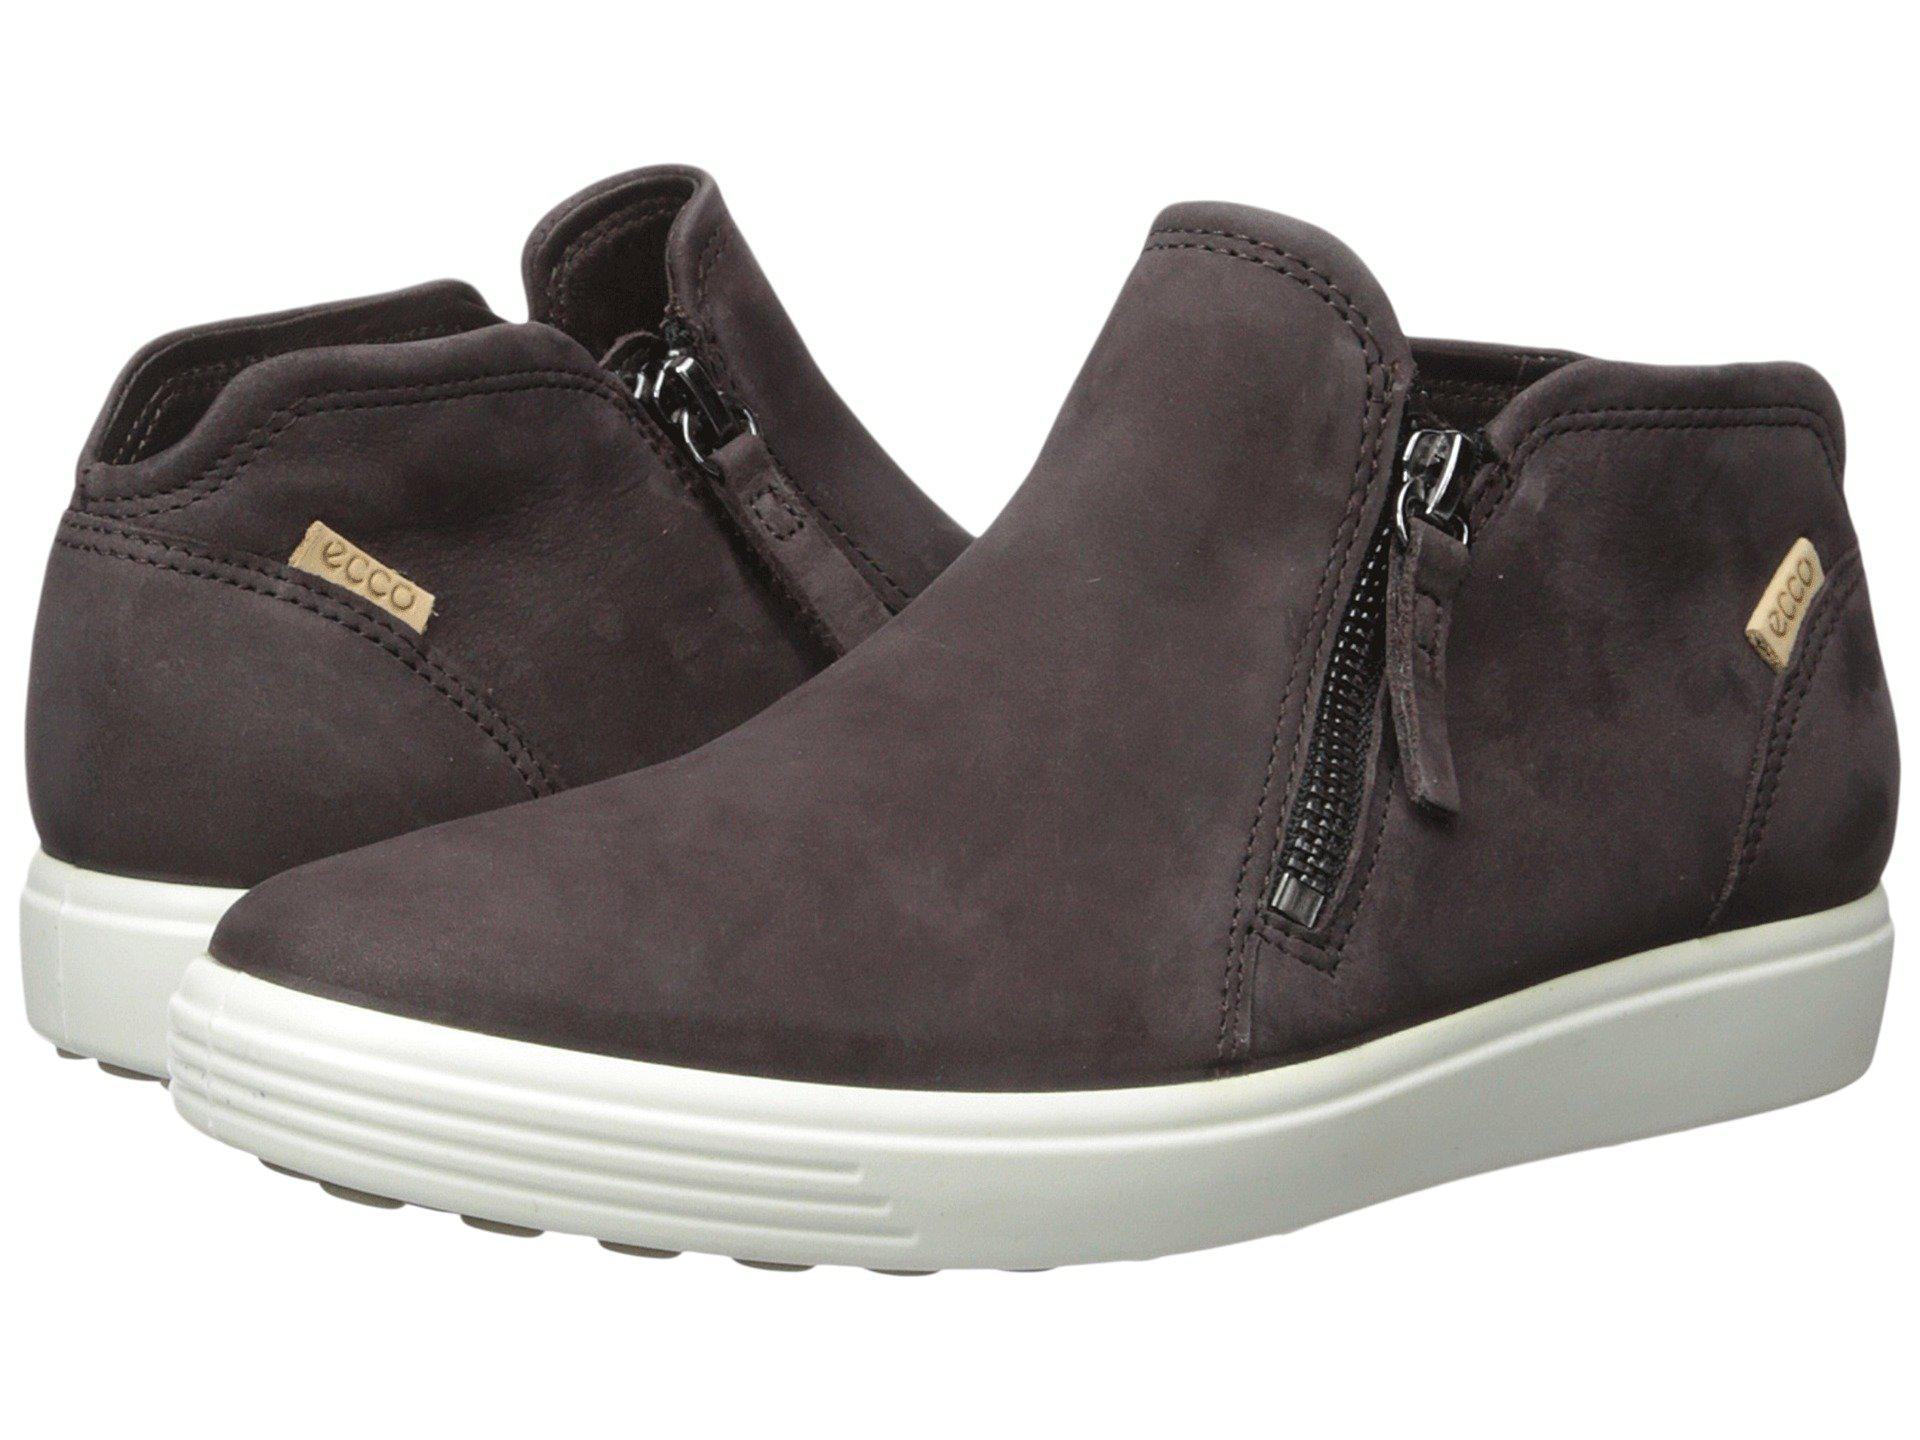 b33c6ae9beb17 Ecco Soft 7 Low Cut Zip Bootie (black Cow Leather) Women's Shoes - Lyst